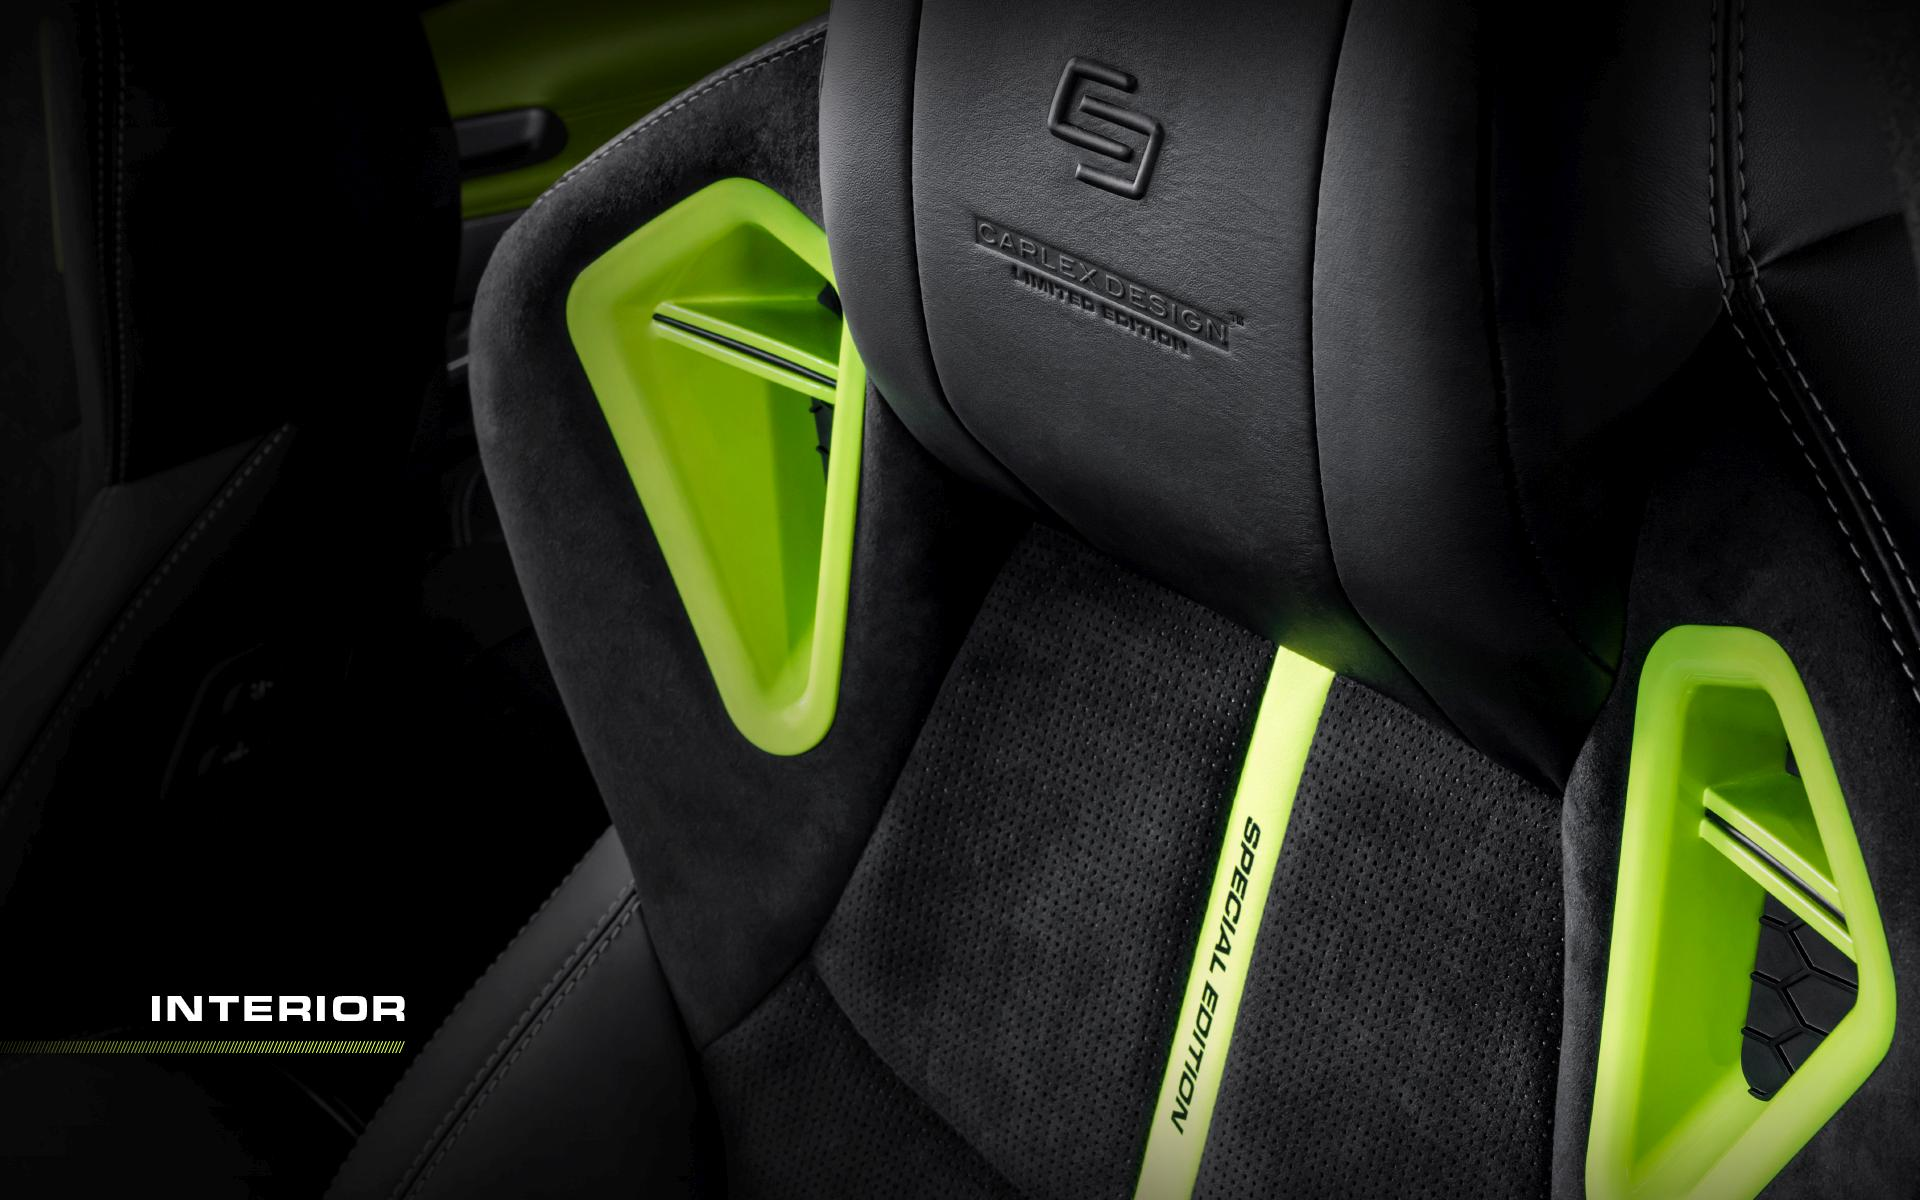 Hyundai-Santa-Fe-by-Carlex-Design-21